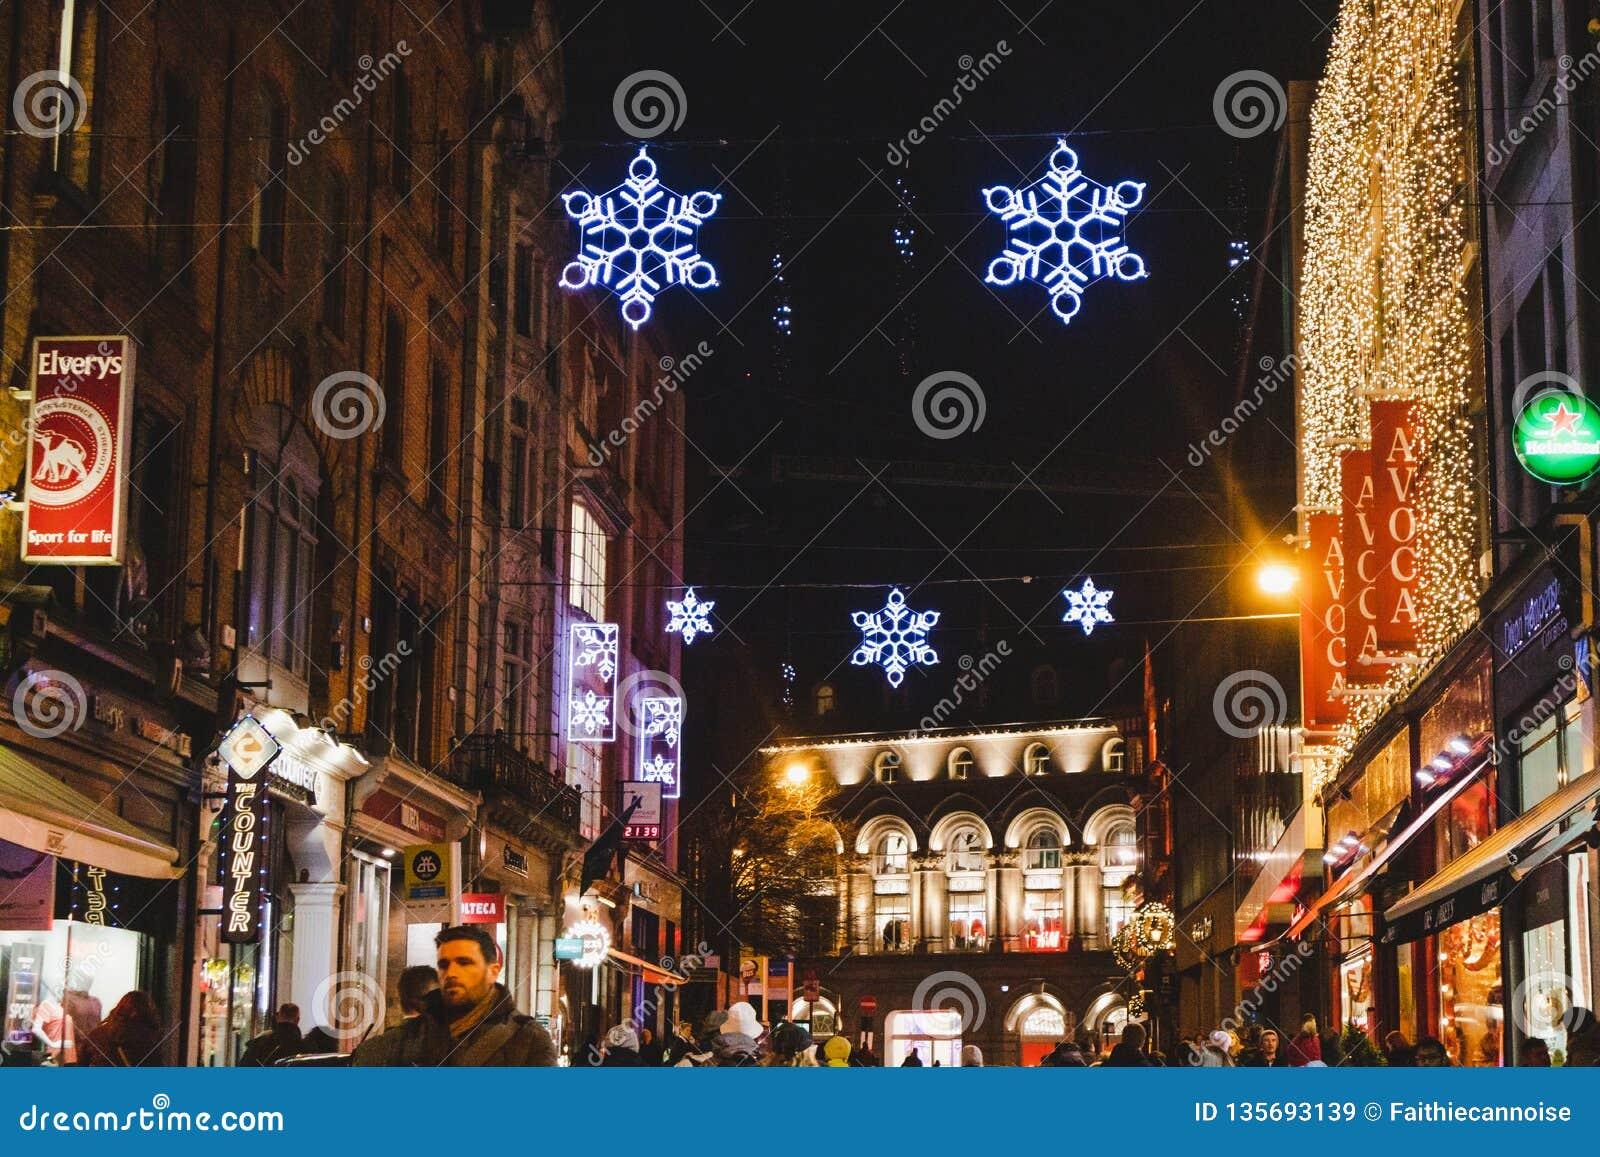 Christmas In Dublin Ireland.Christmas Decorations In Dublin City Centre Near Grafton